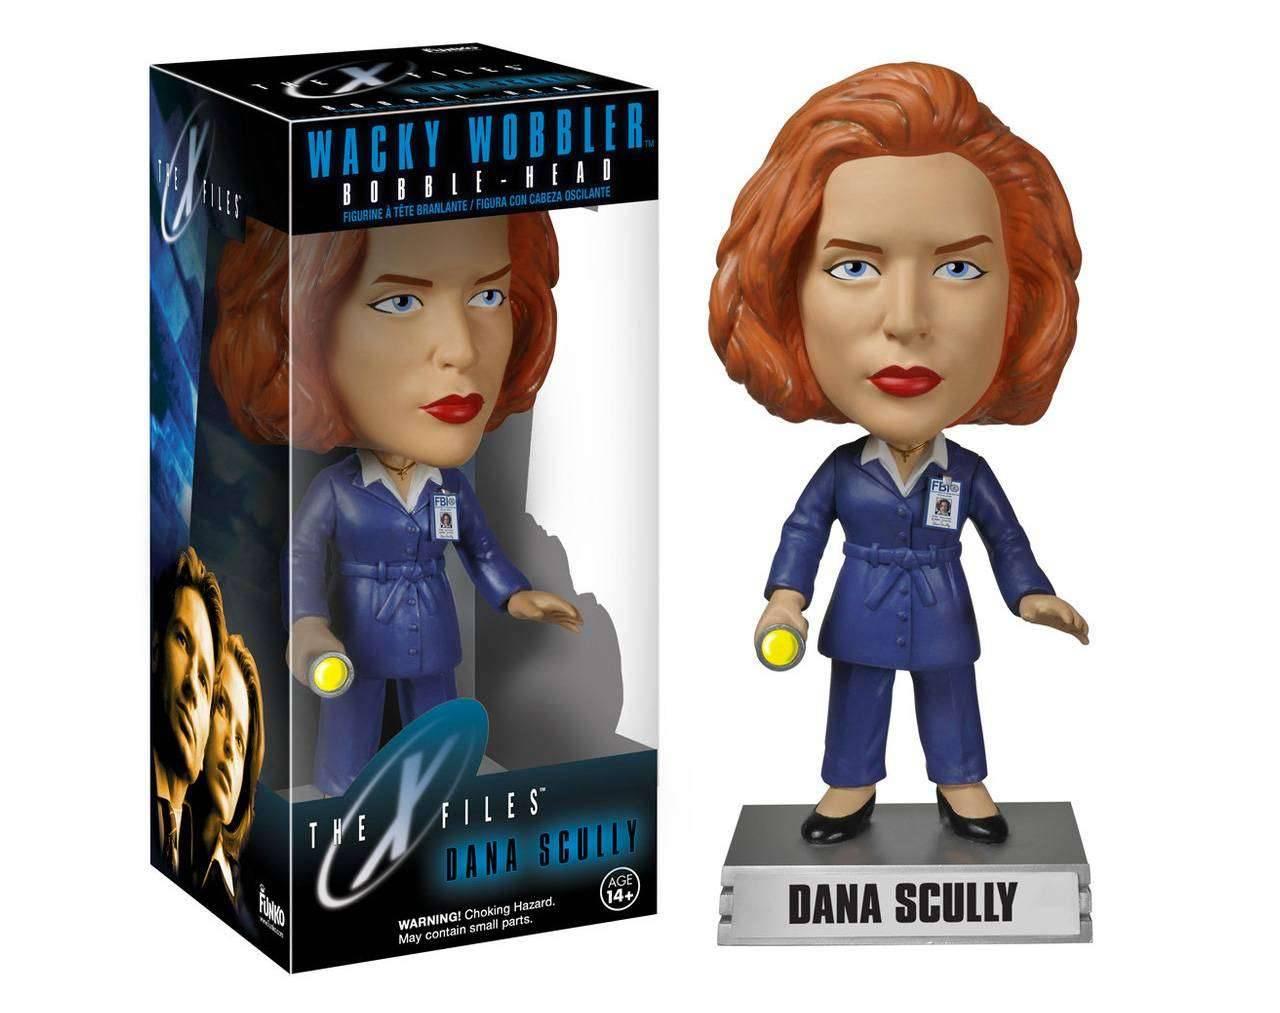 Danna Scully Wacky Wobbler